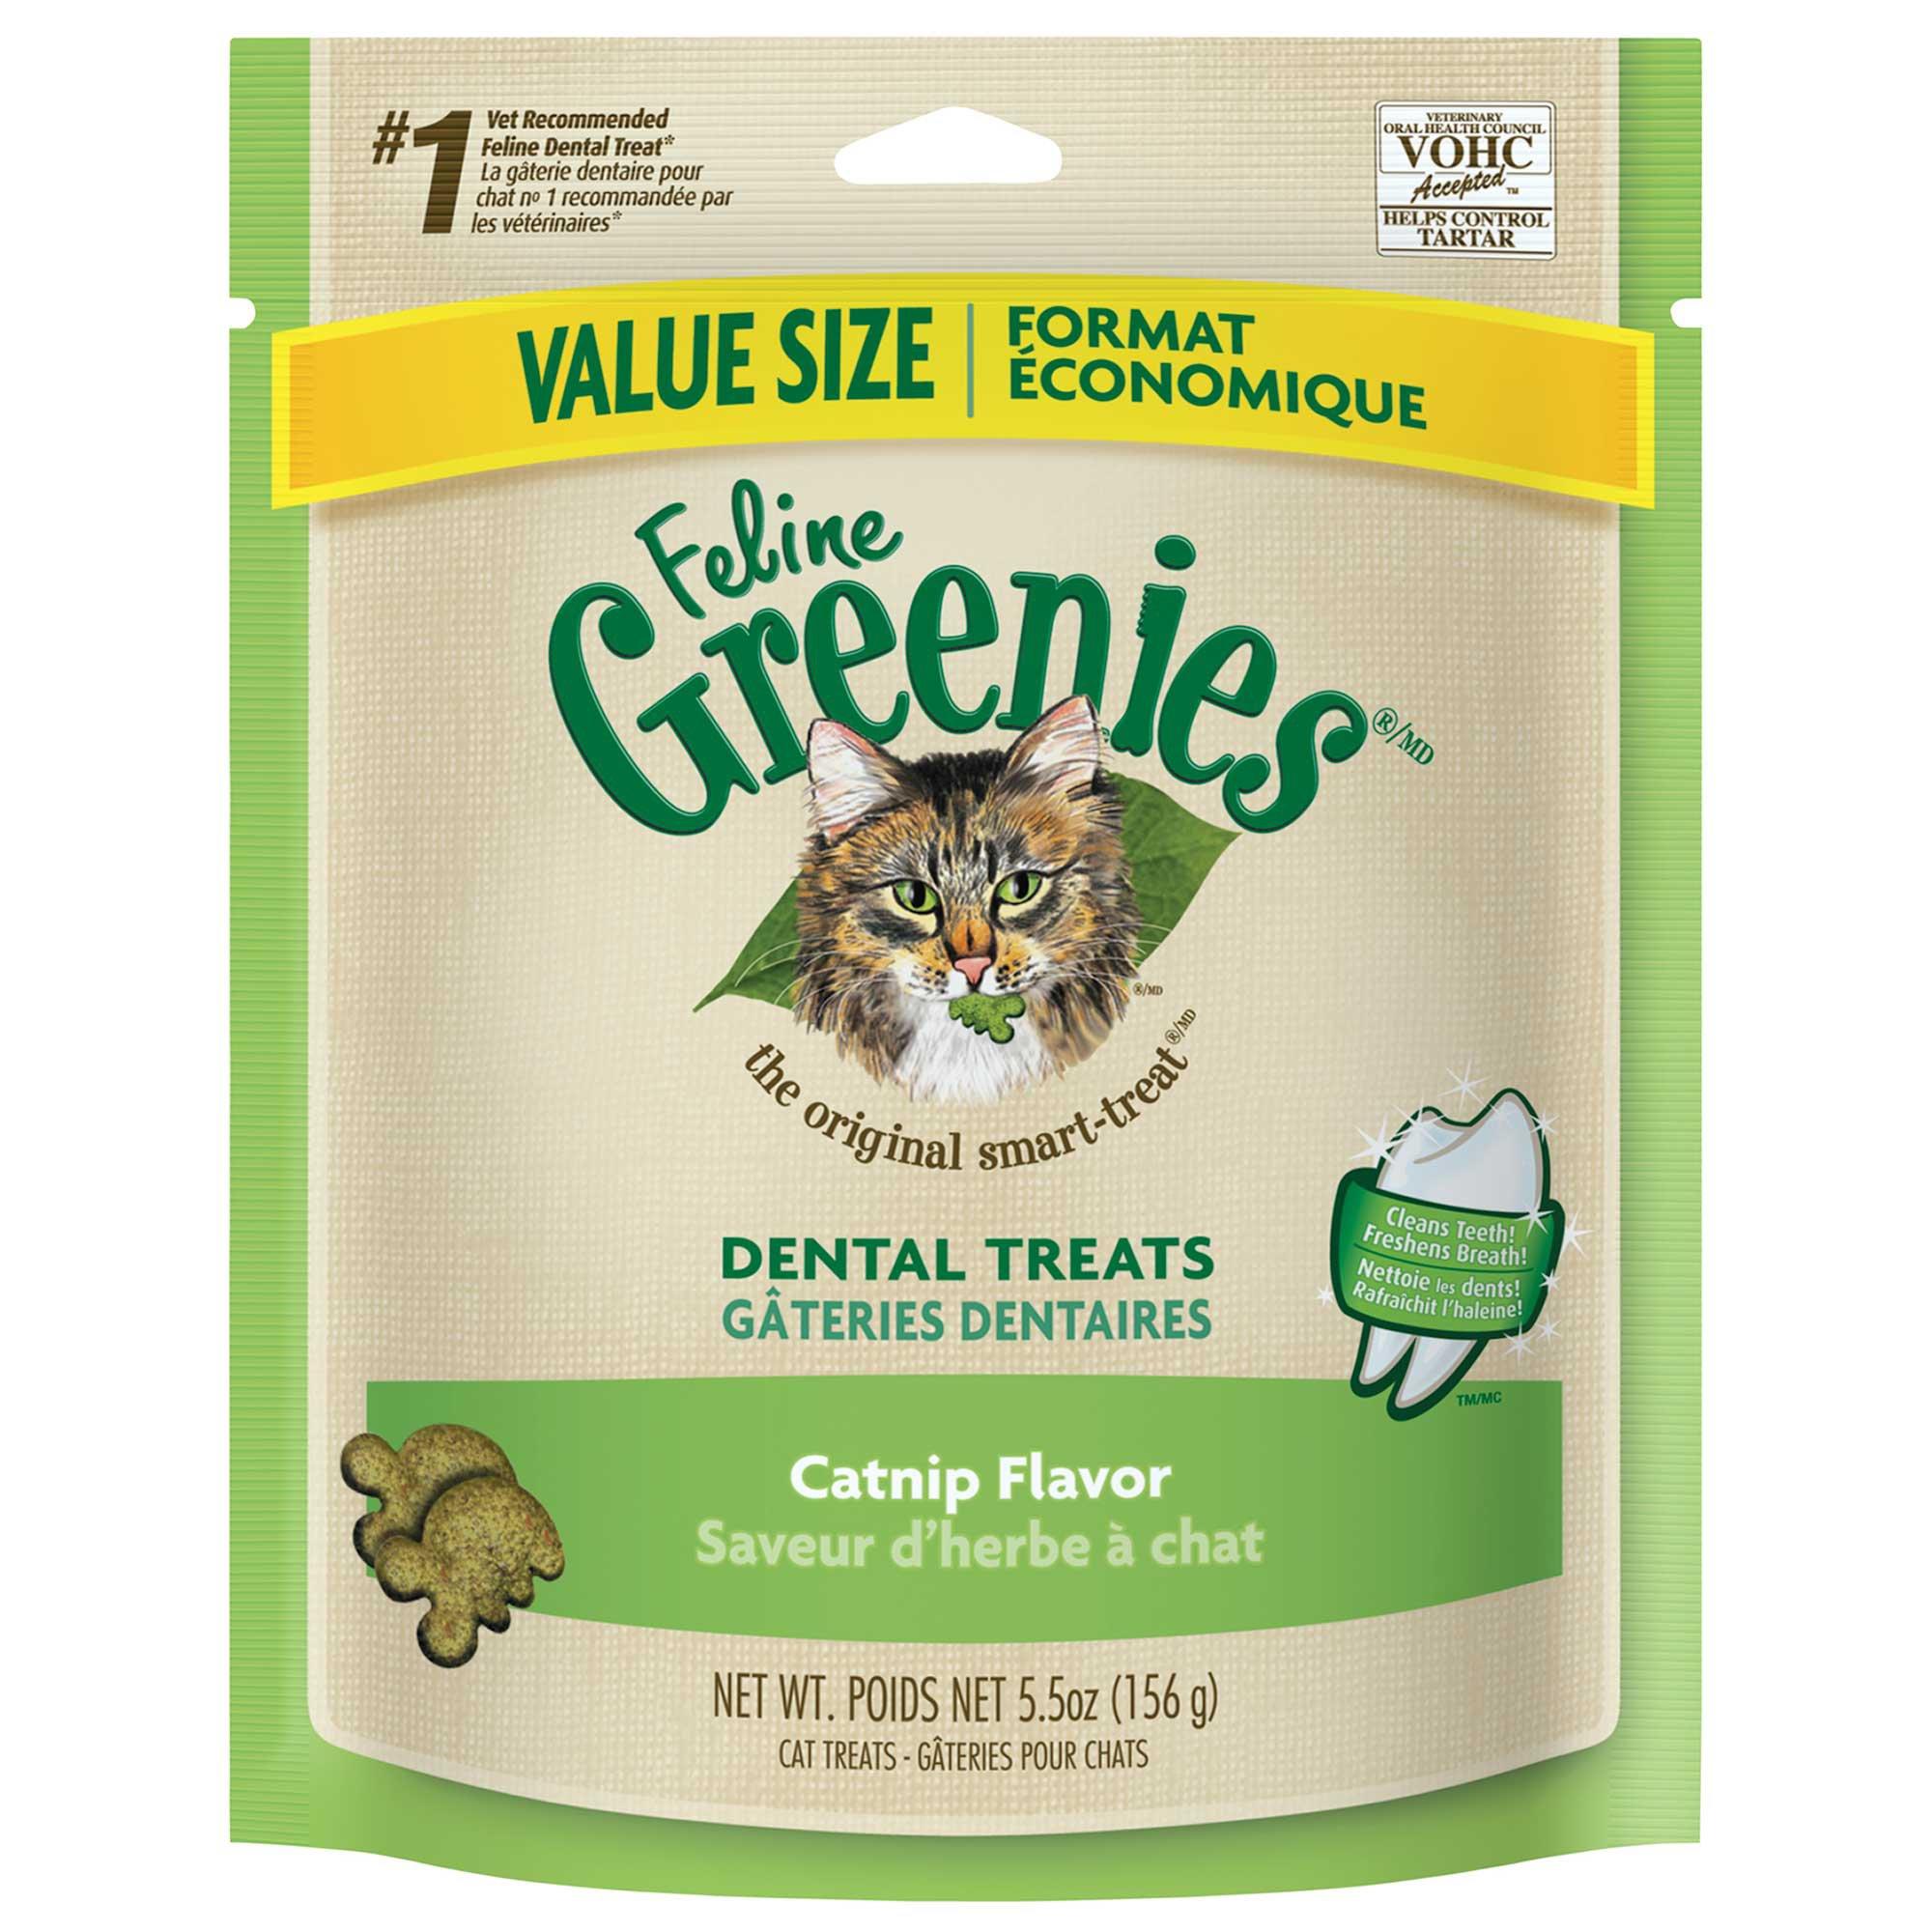 Image of Feline Greenies Catnip Flavor Dental Cat Treat, 5.5 oz.